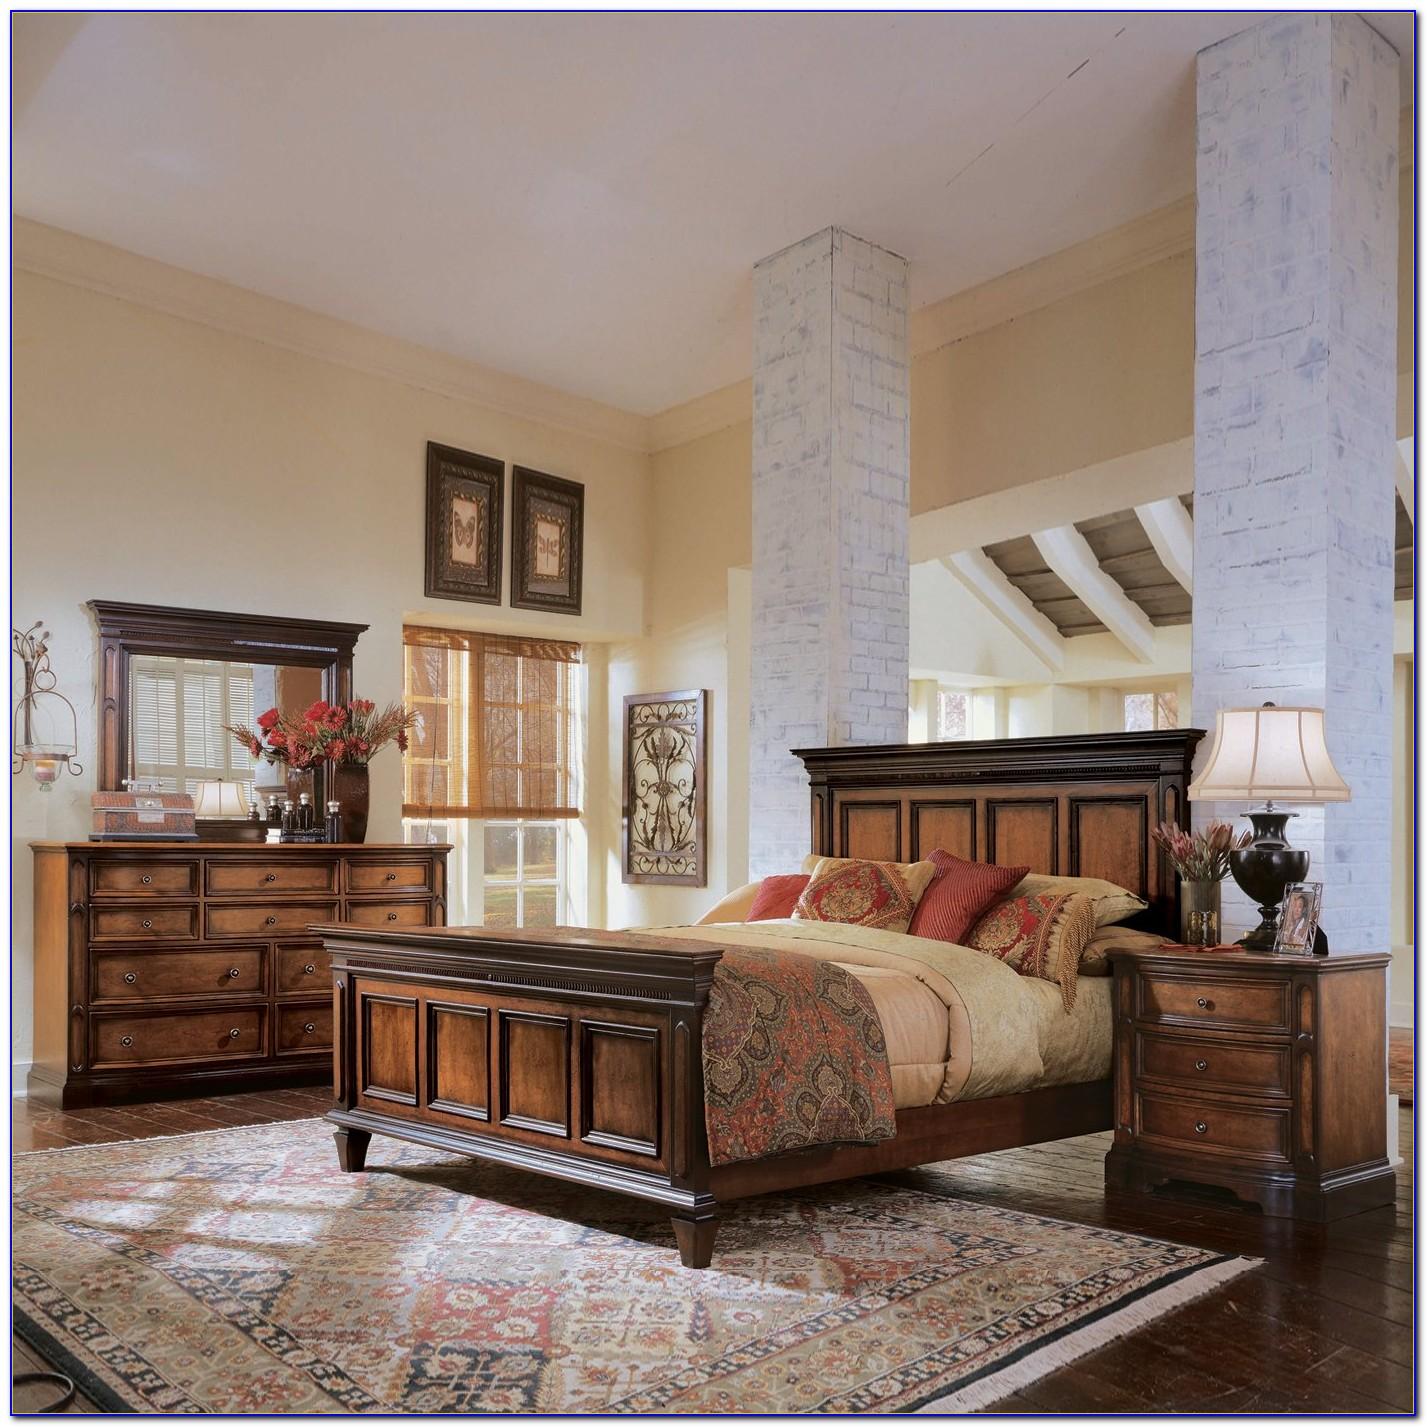 Atlanta Two Tone Bedroom Furniture